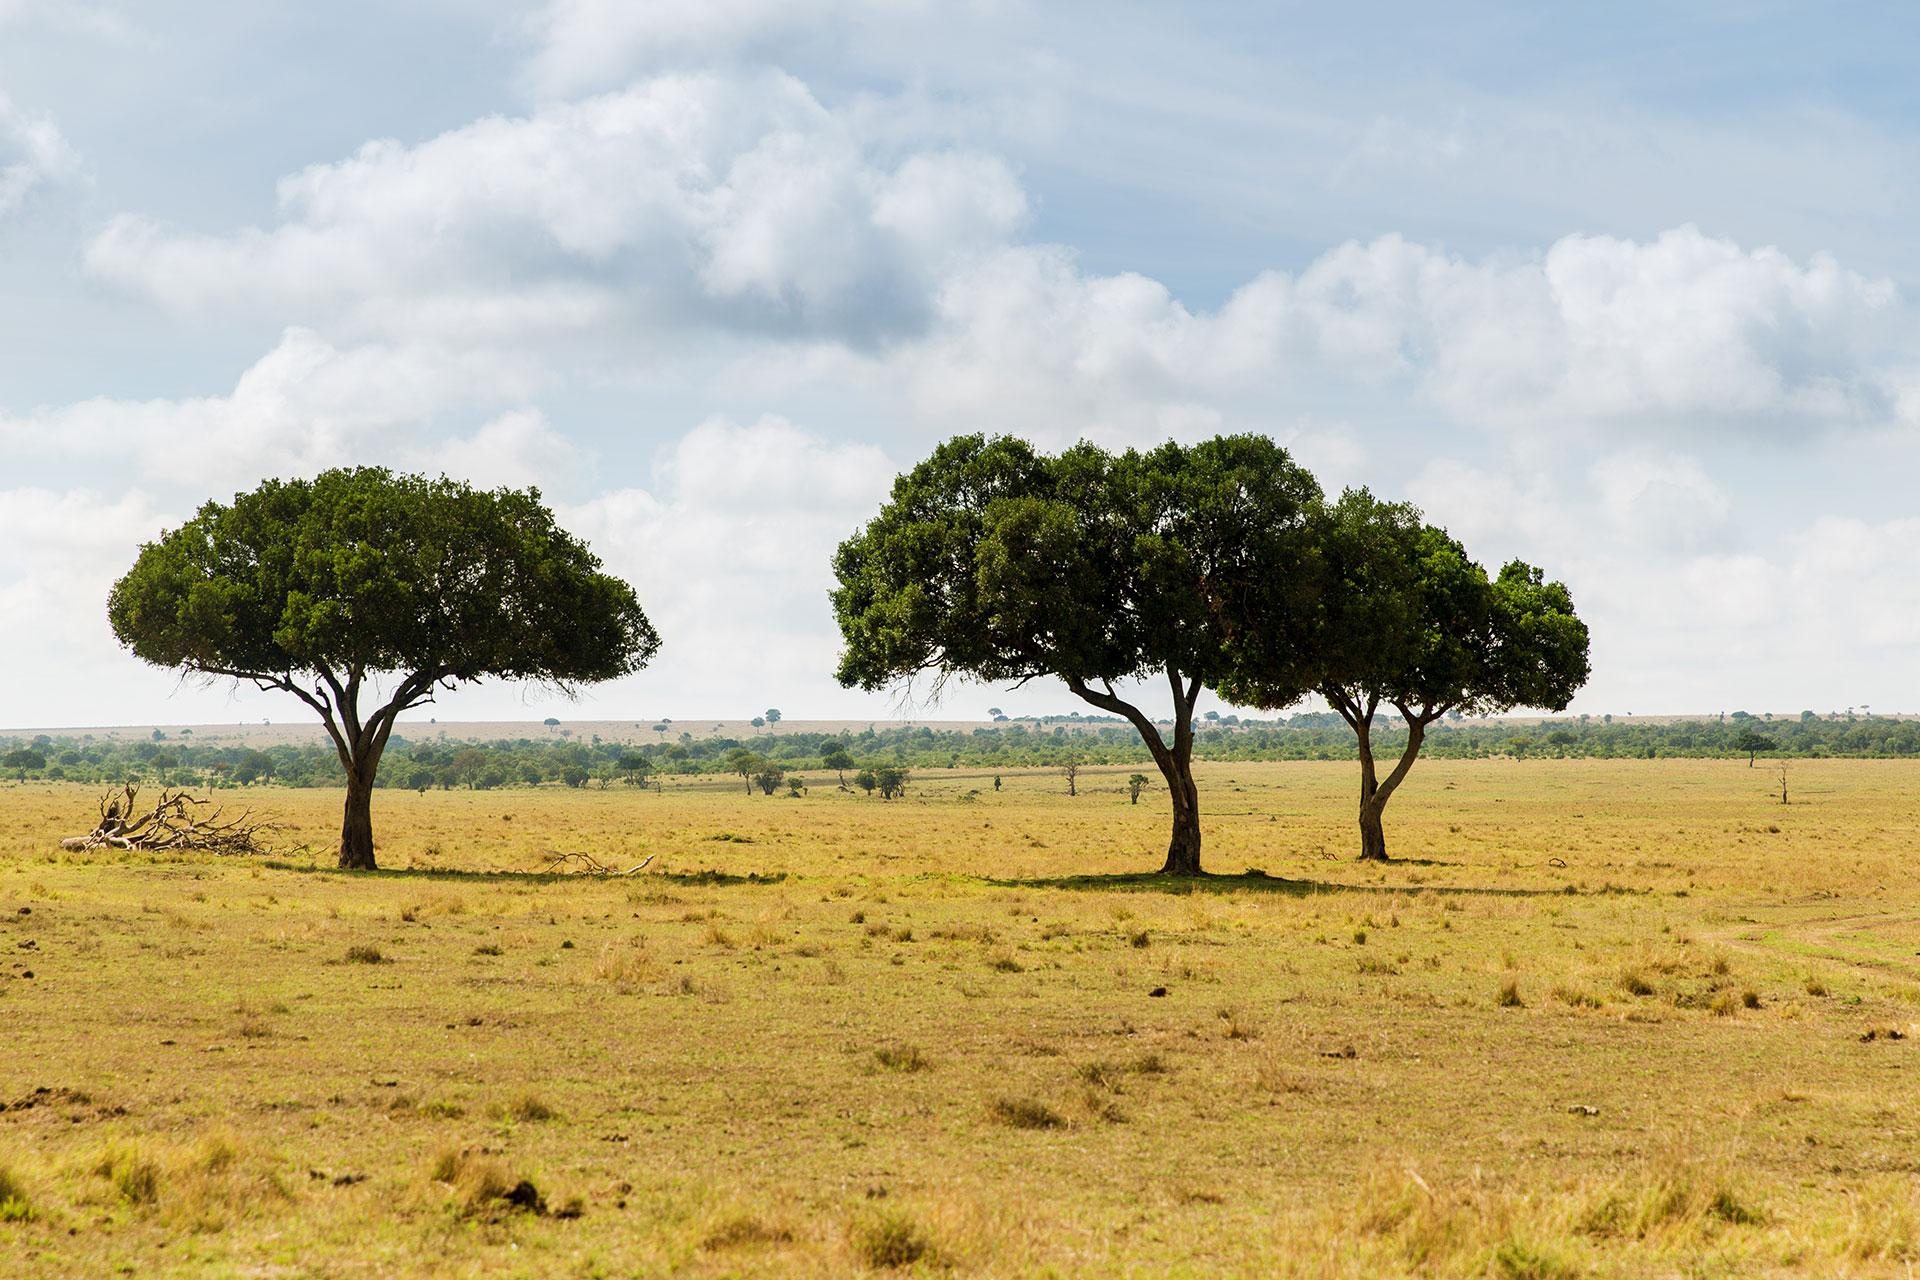 agroforestazione: la savana